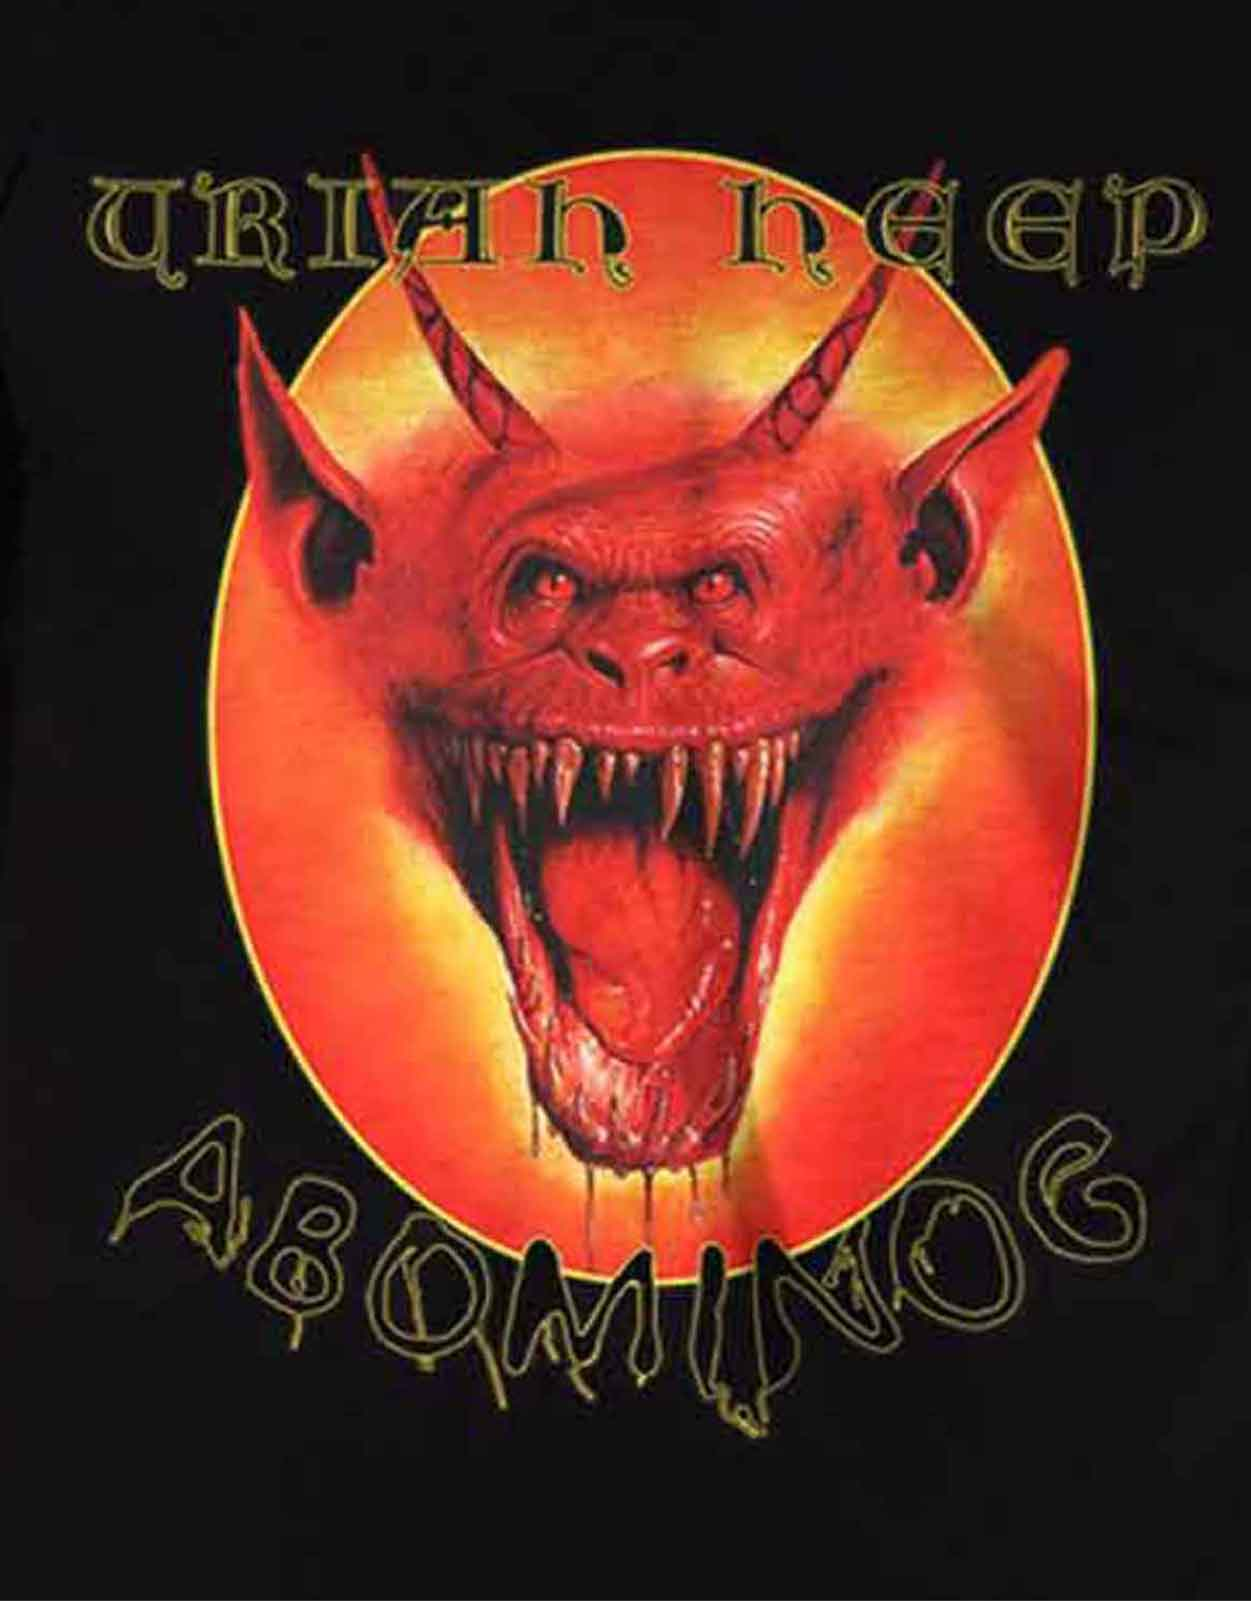 Uriah Heep - On the Rebound